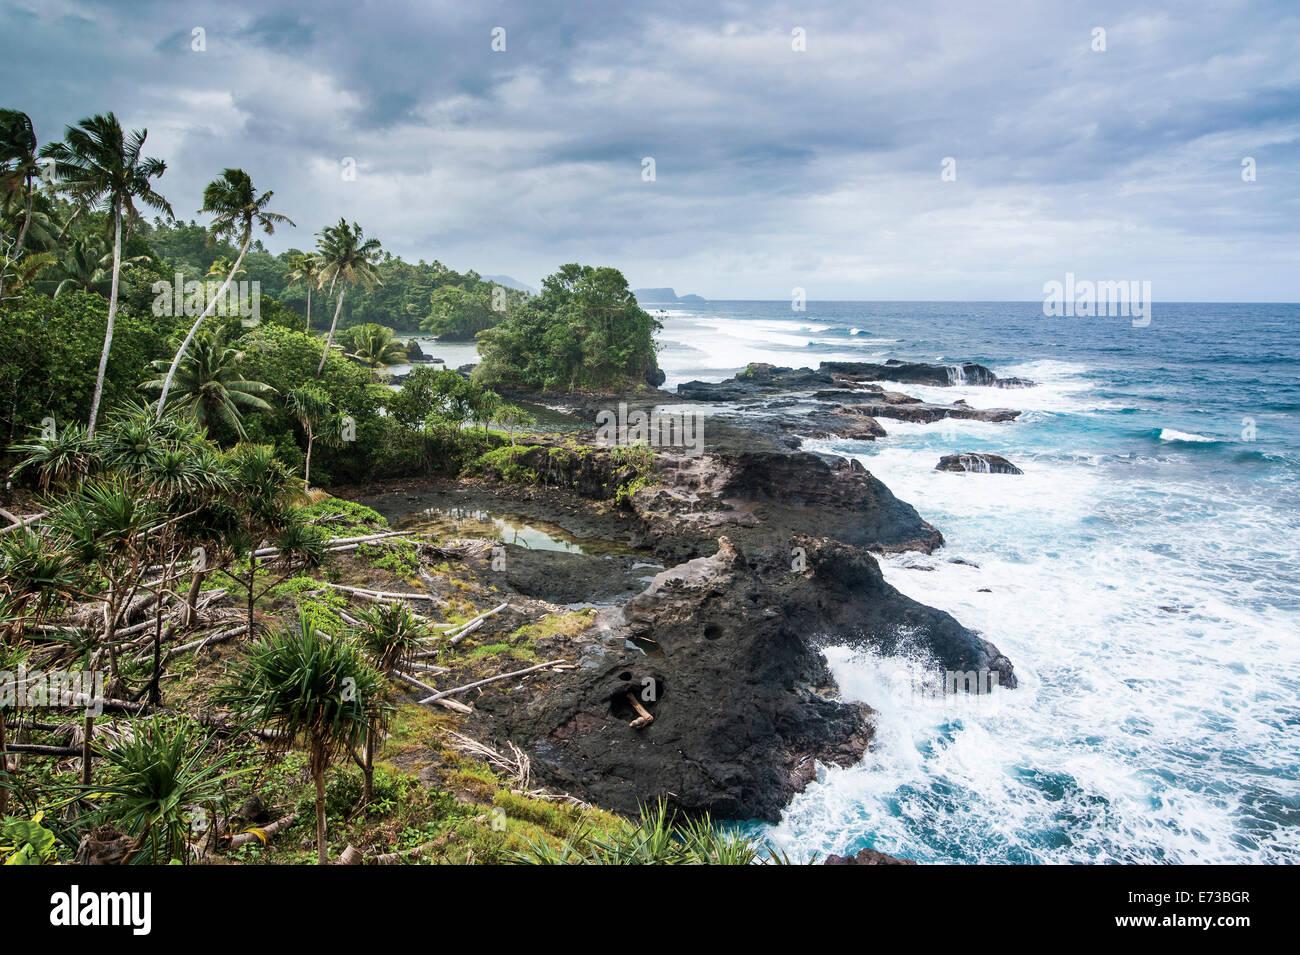 Wild rocky coast of Upolu, Samoa, South Pacific, Pacific - Stock Image